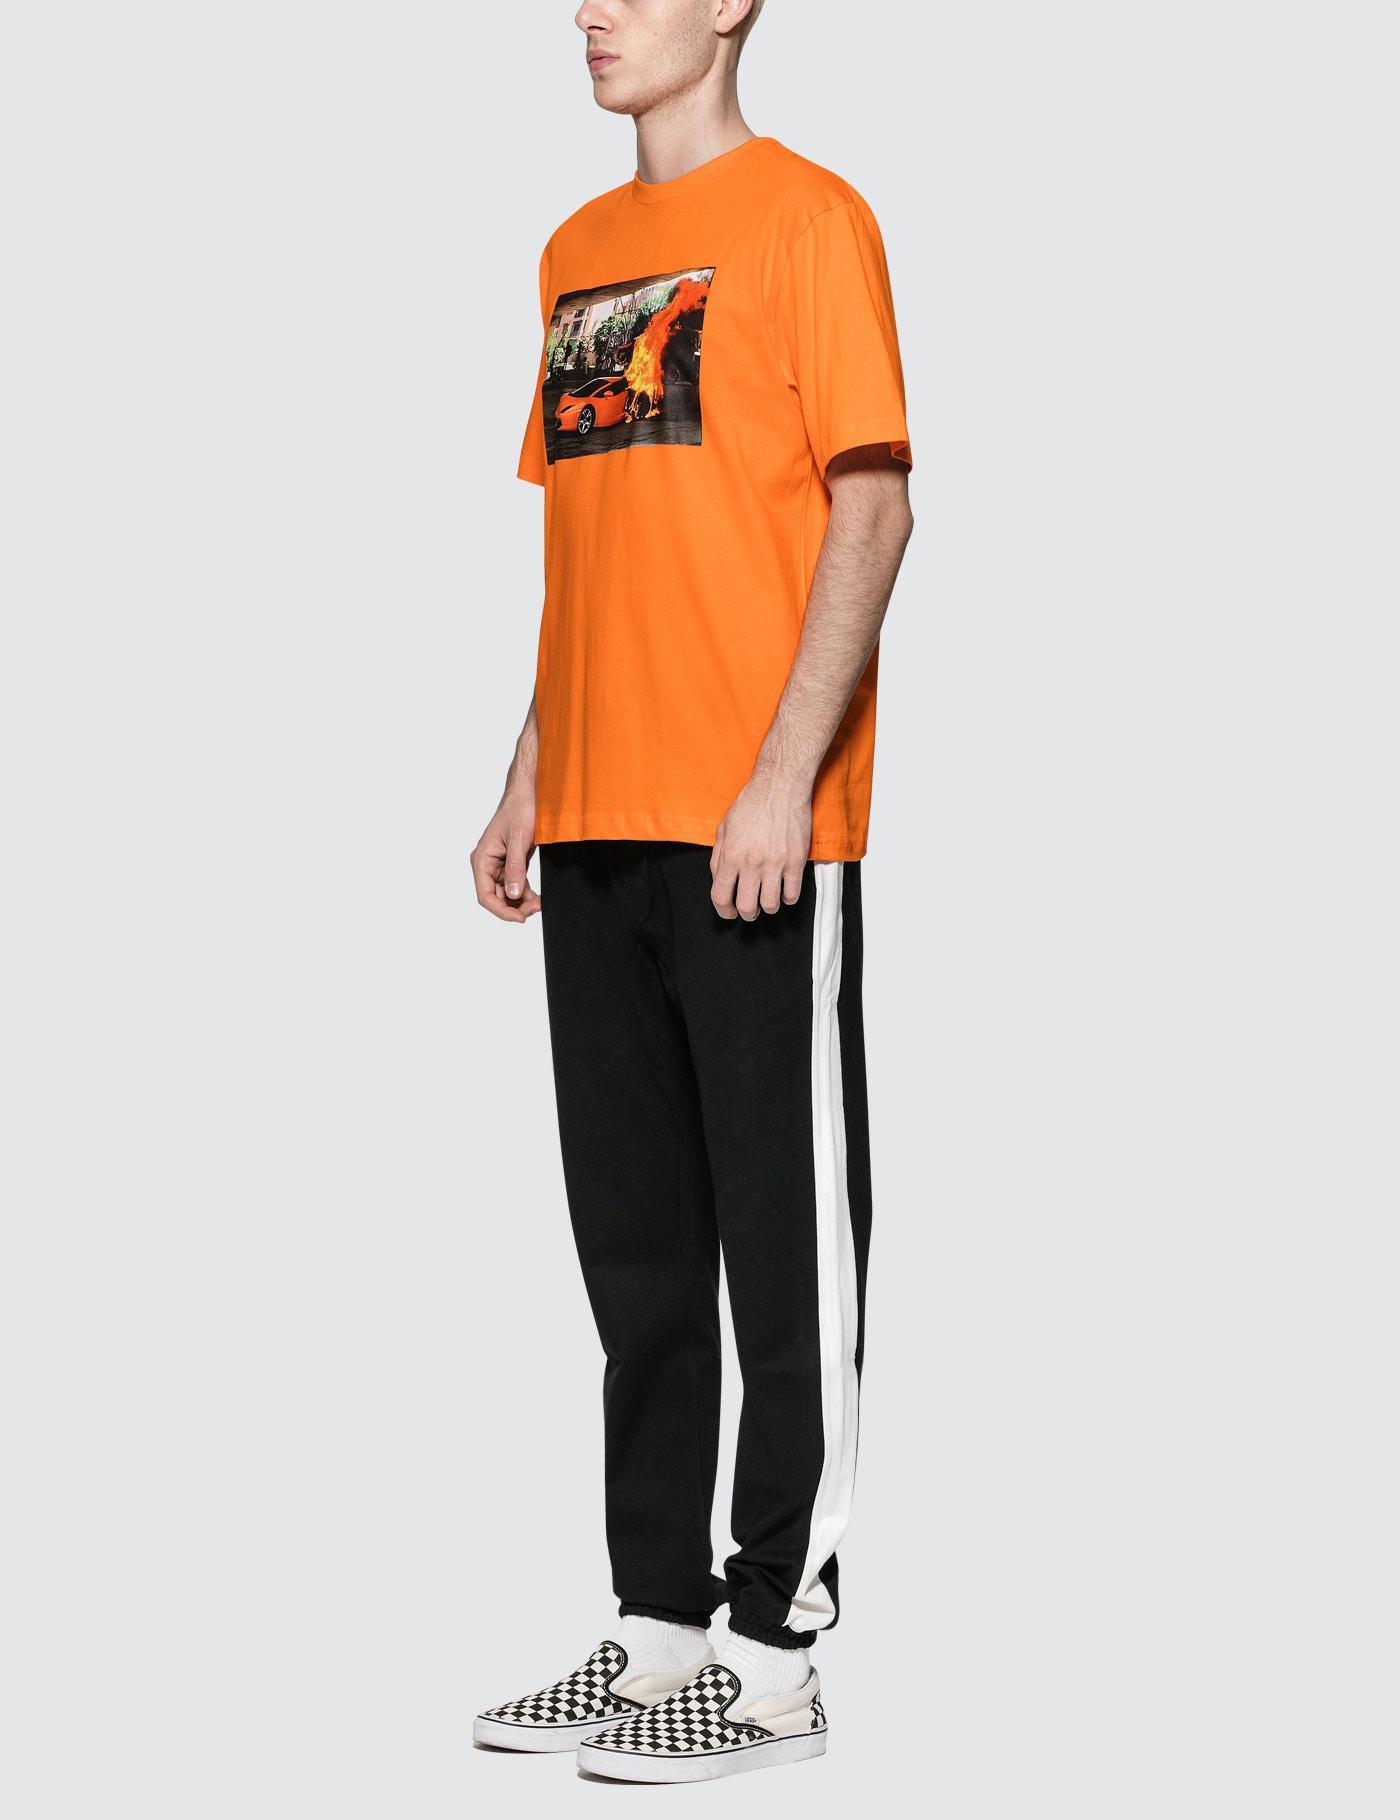 lyst wasted paris lamborghini t shirt in orange for men. Black Bedroom Furniture Sets. Home Design Ideas